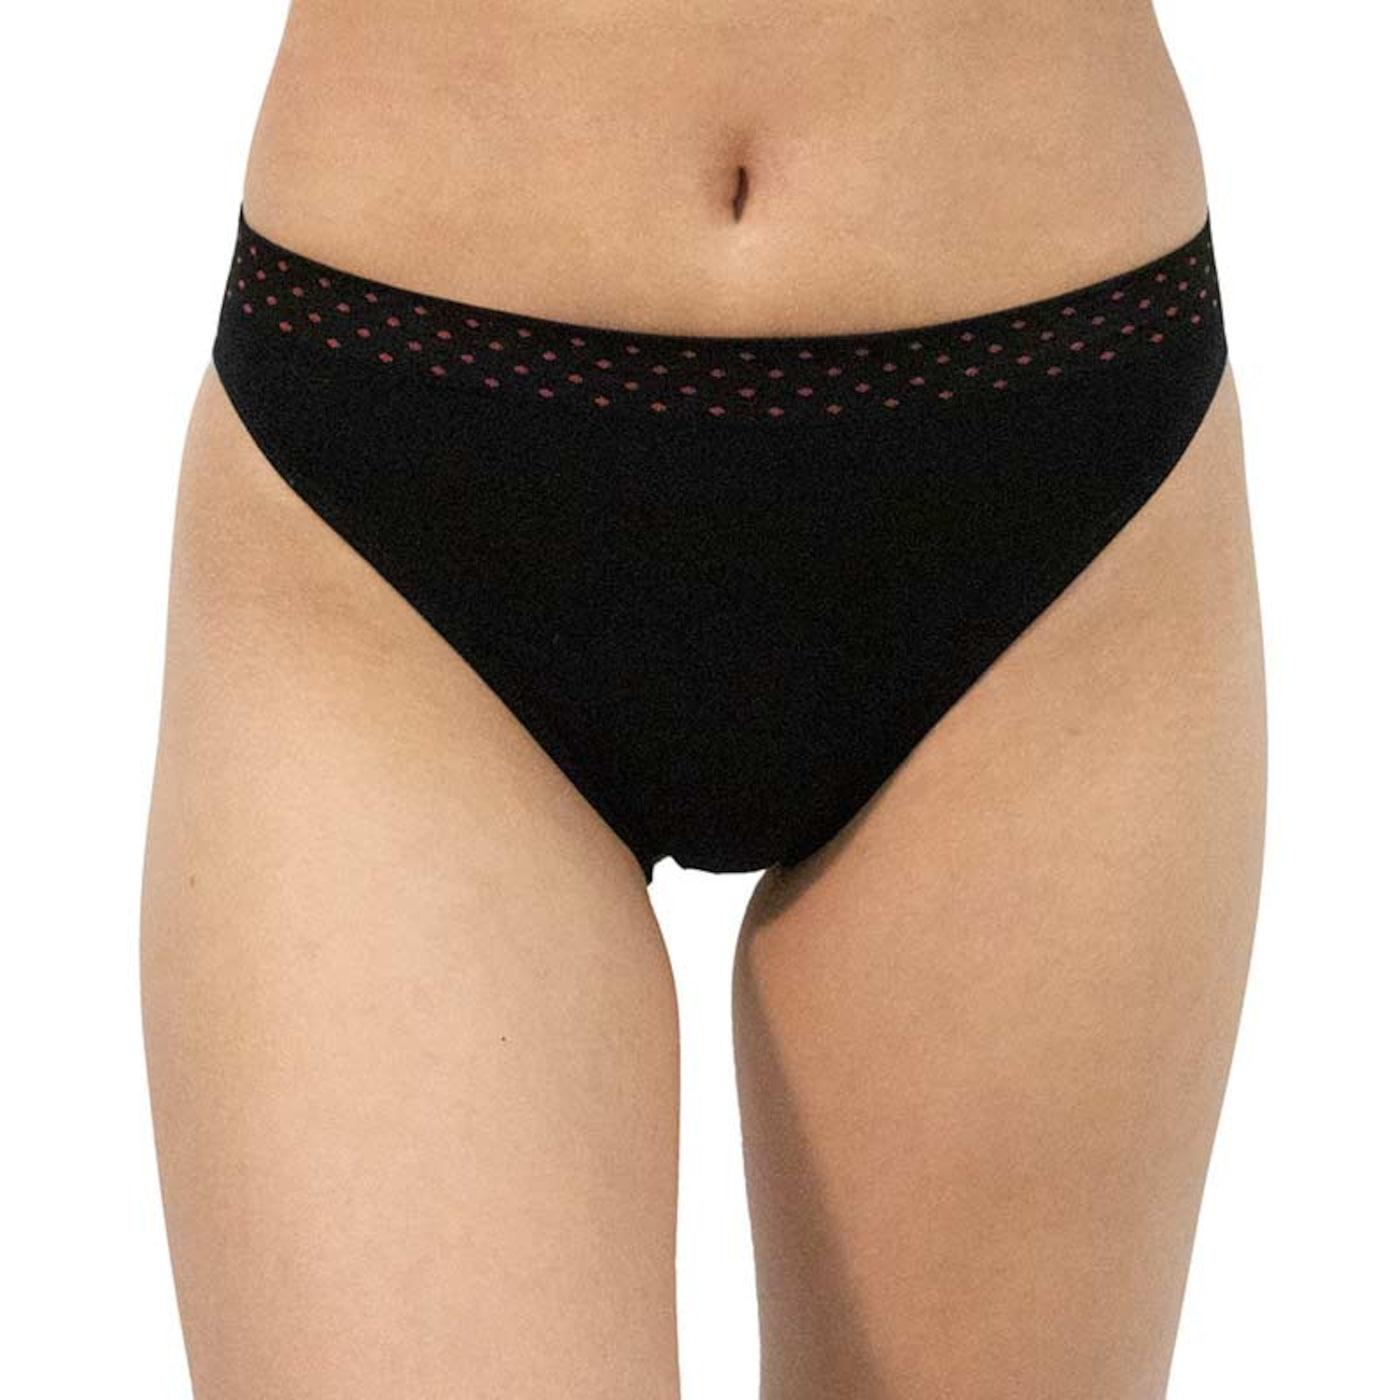 Women's panties Gina black  dámské Neurčeno M